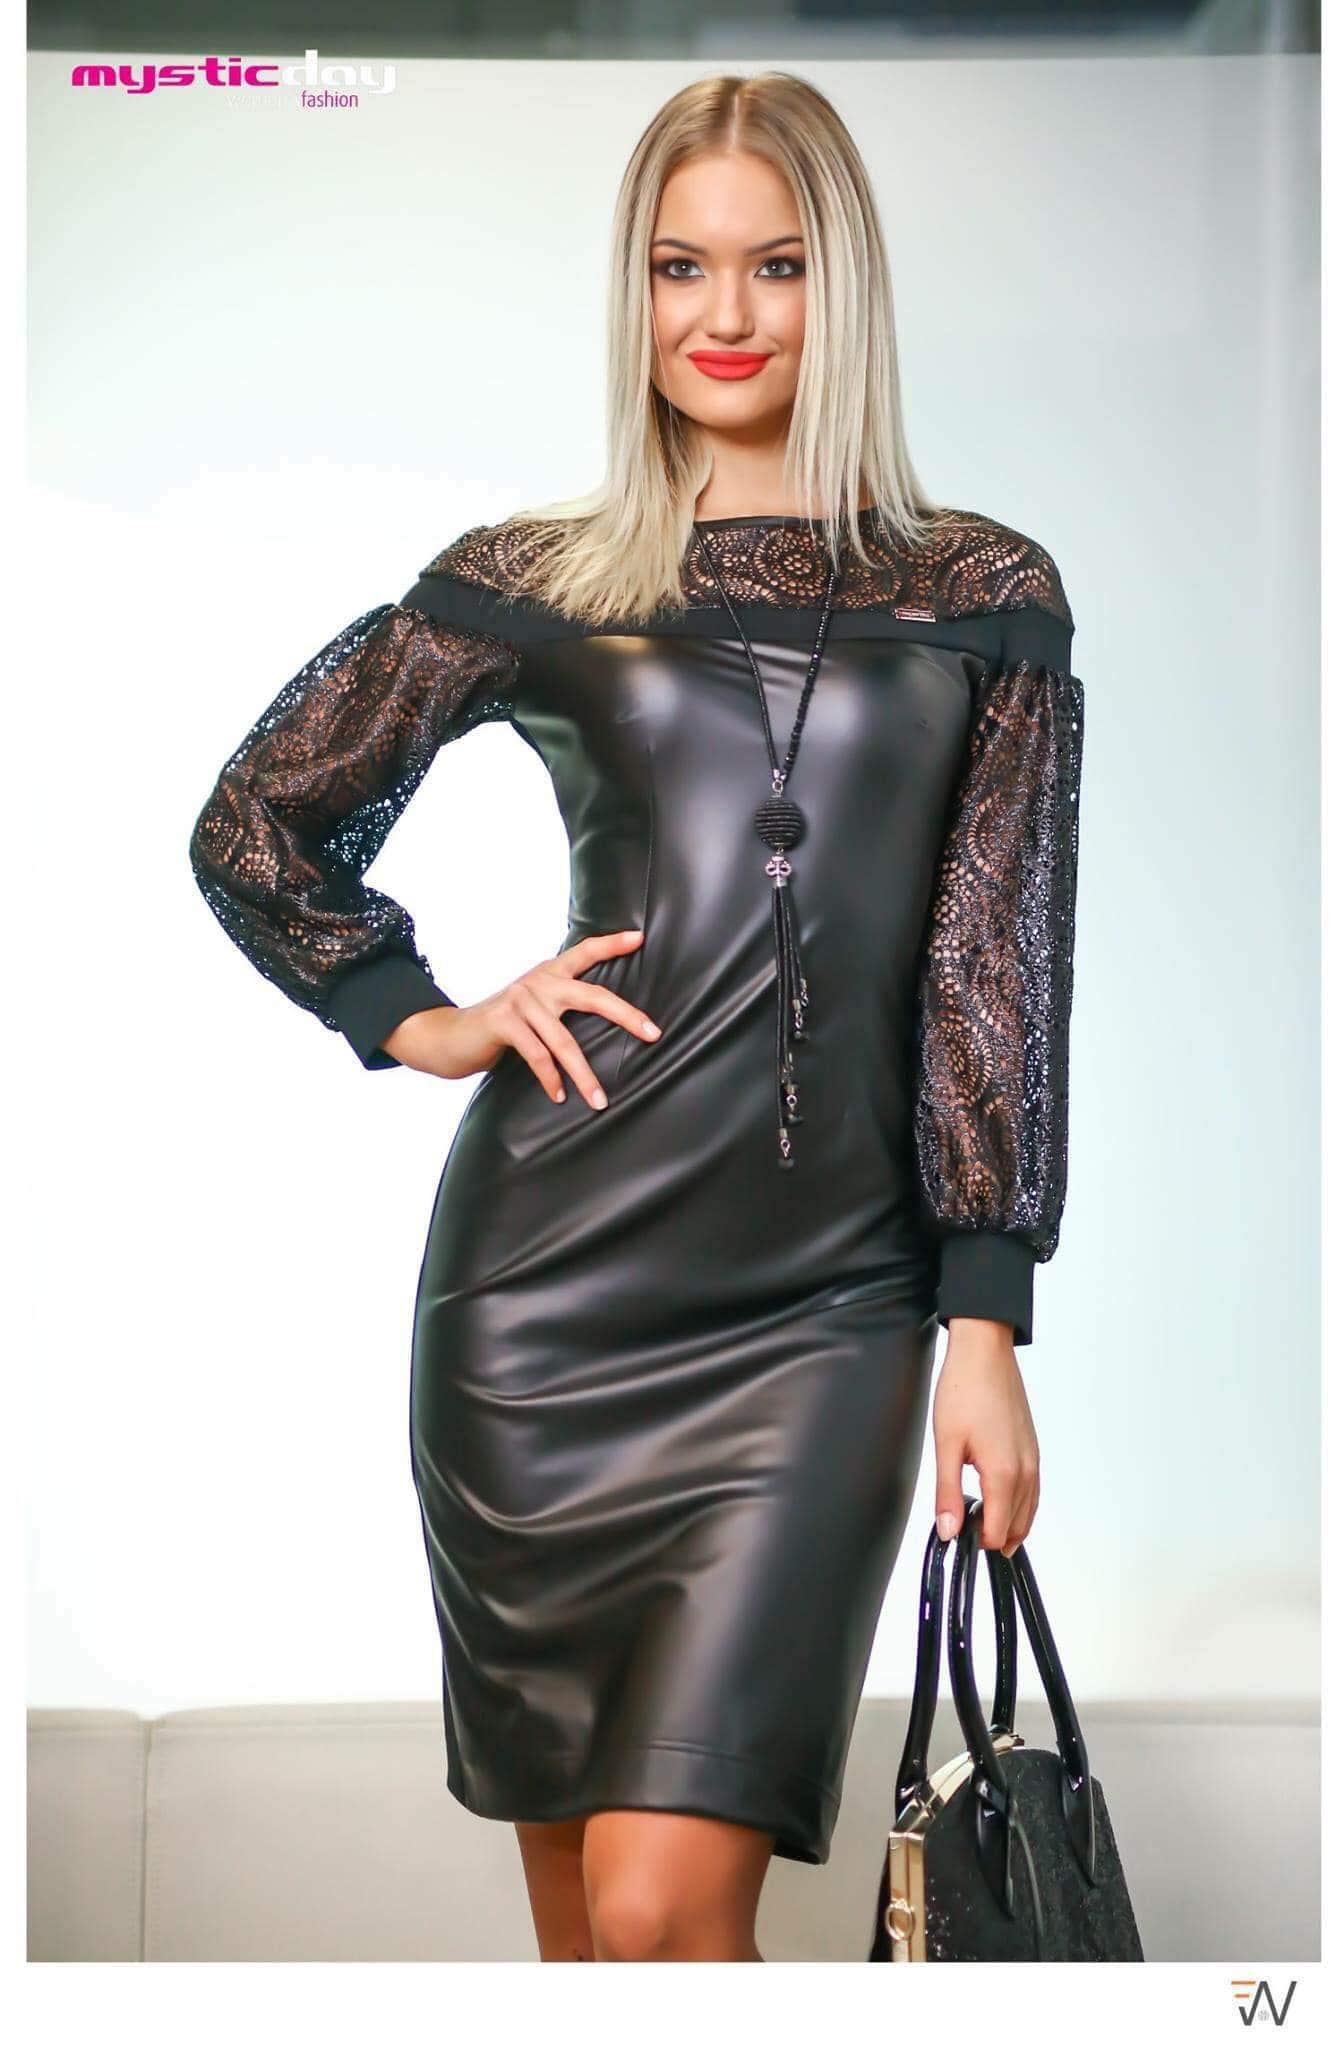 Anissza fekete buggyos ujjú műbőr ruha - Cool Fashion 02fcad3f4e